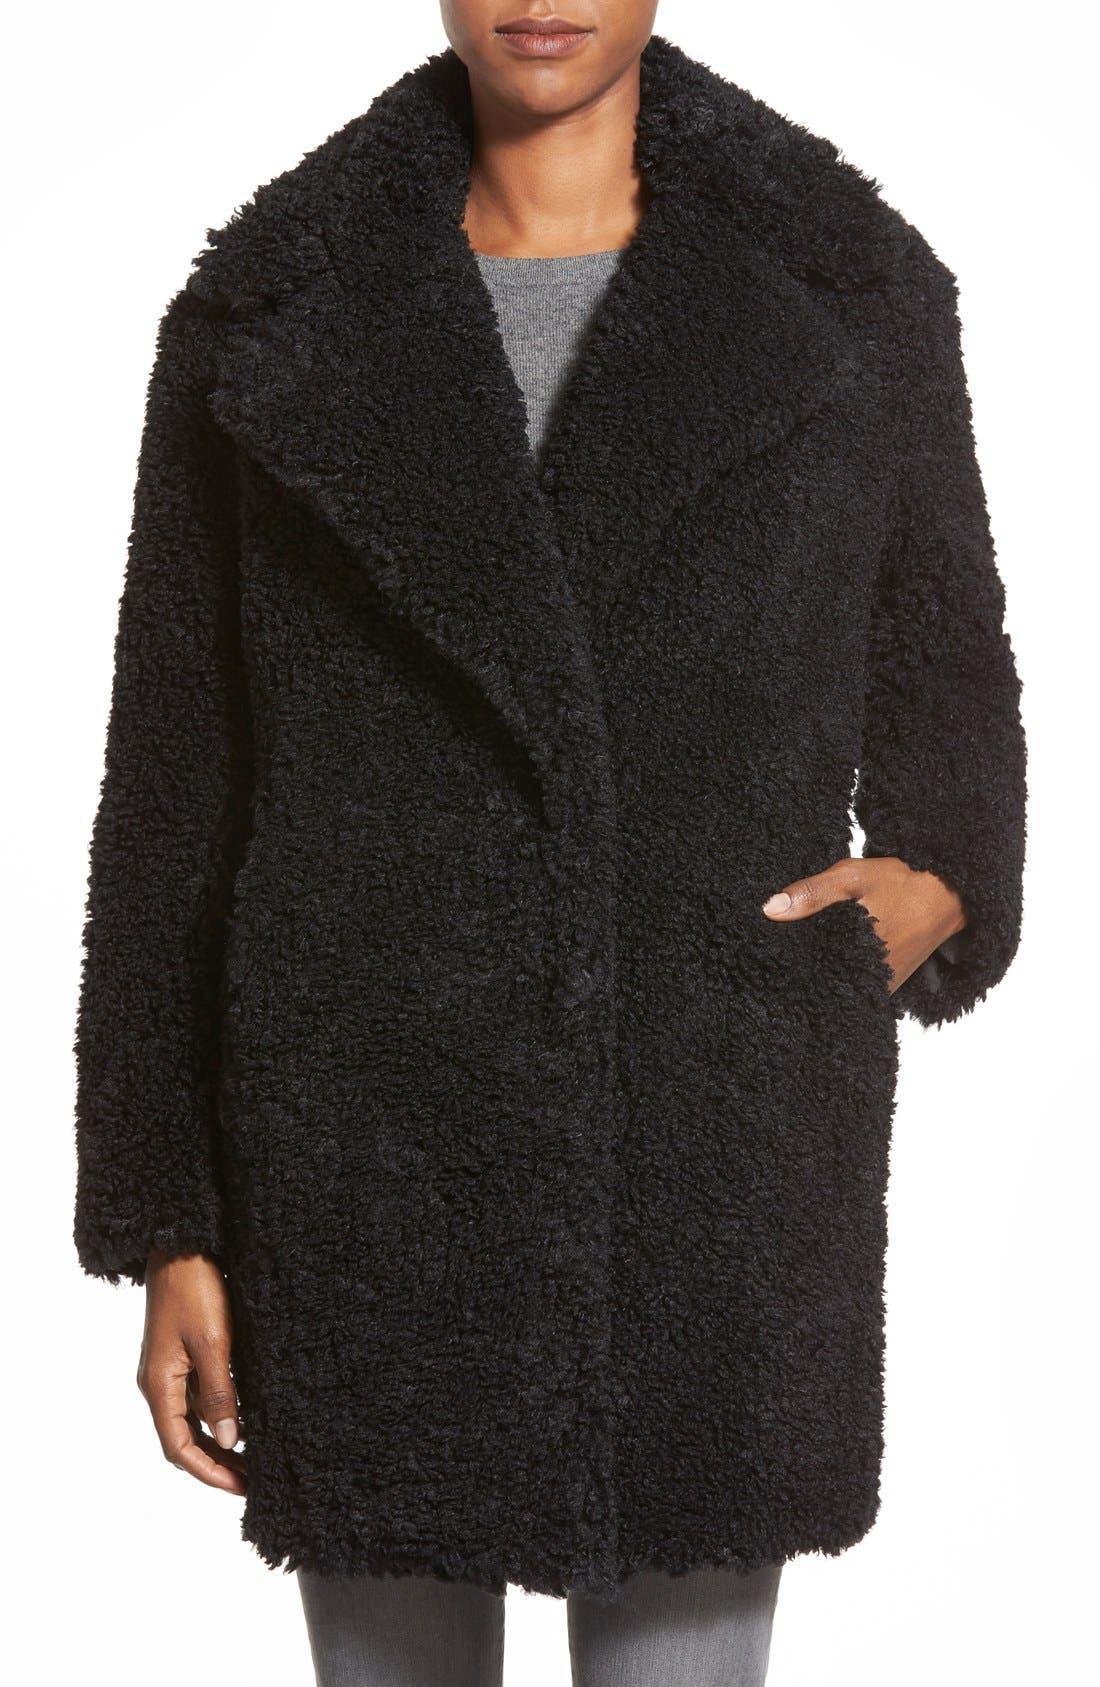 'Teddy Bear' Notch Collar Reversible Faux Fur Coat,                         Main,                         color, 001